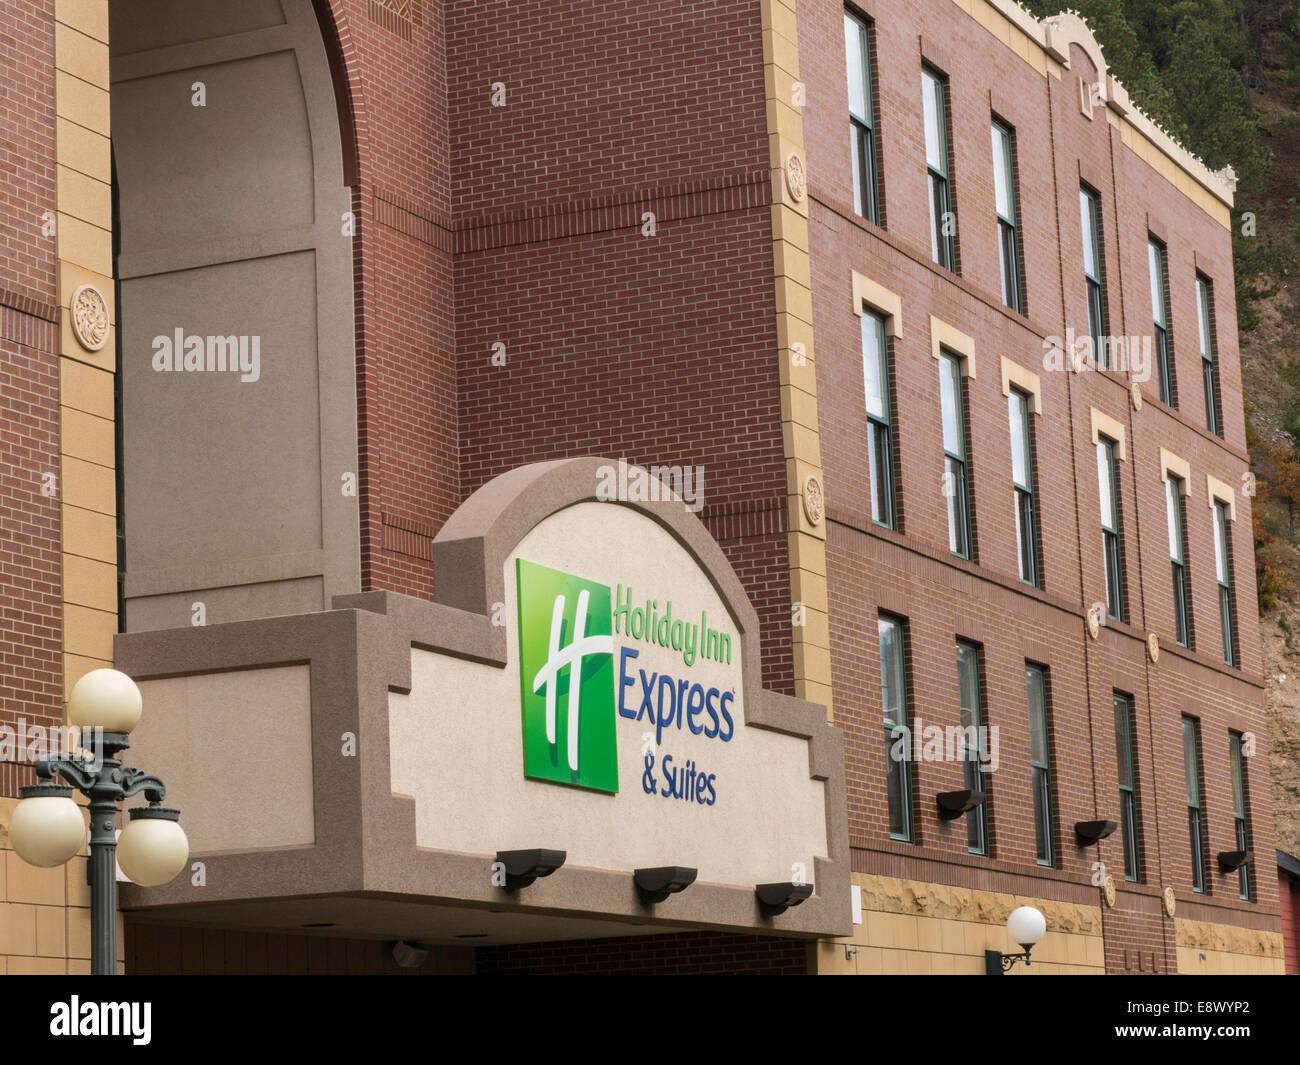 Front Entrance Holiday Inn Express Stock Photos & Front Entrance ...